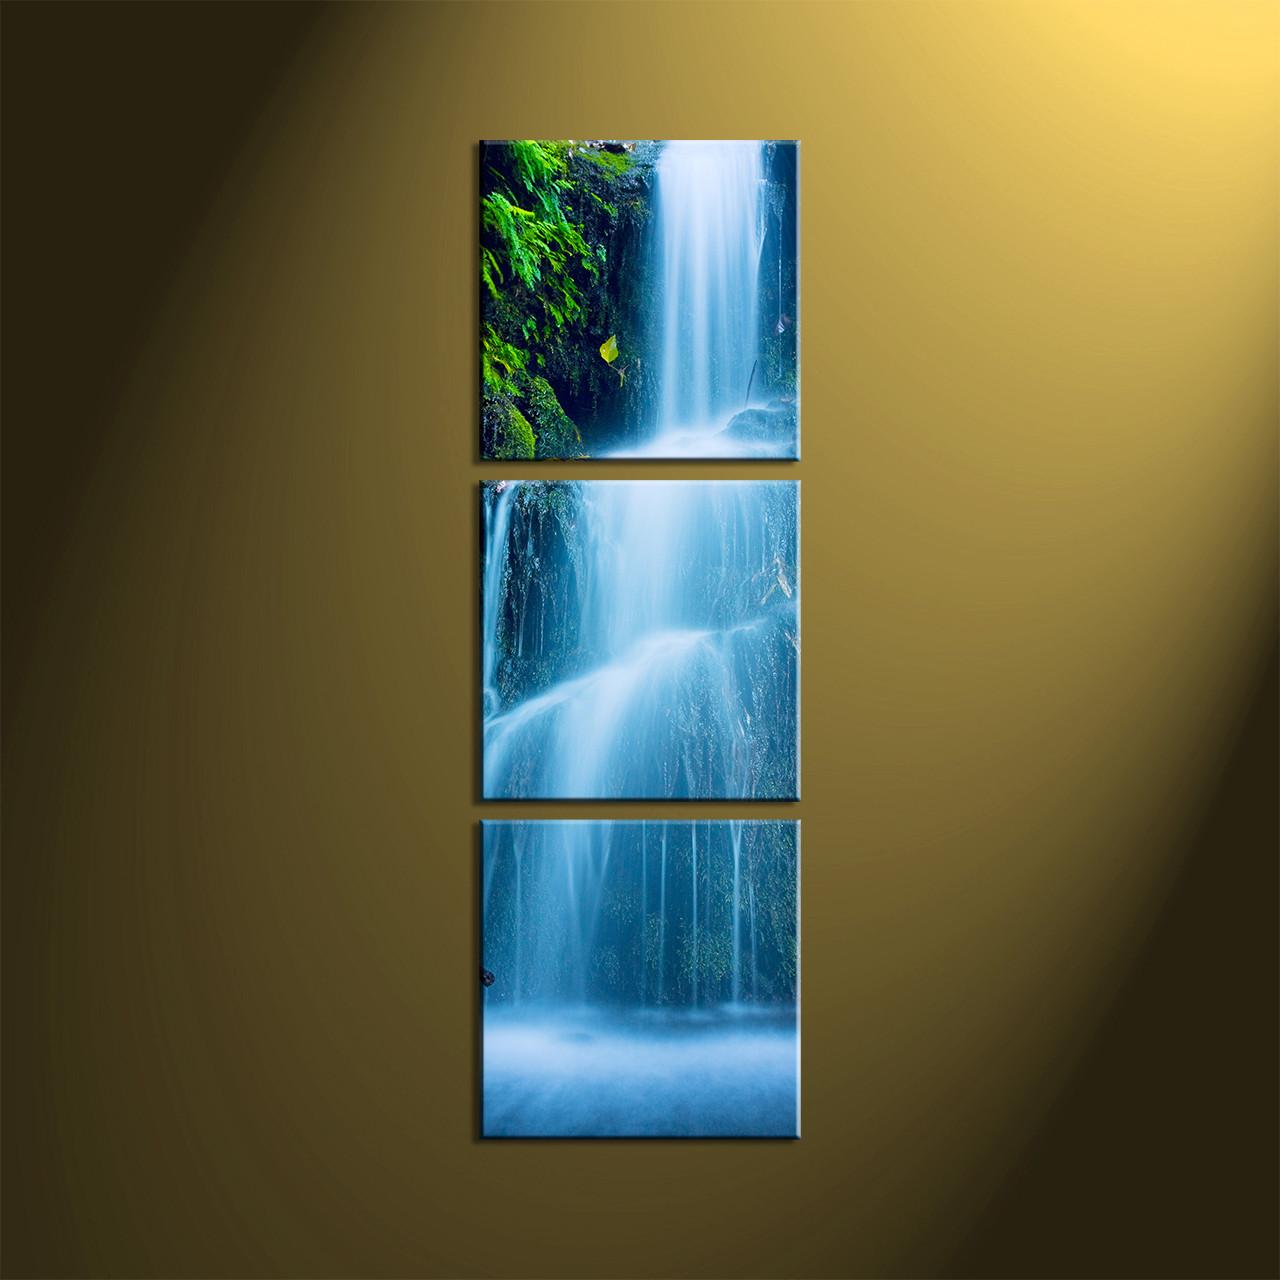 Waterfall Wall Art 3 piece green scenery nature waterfall art